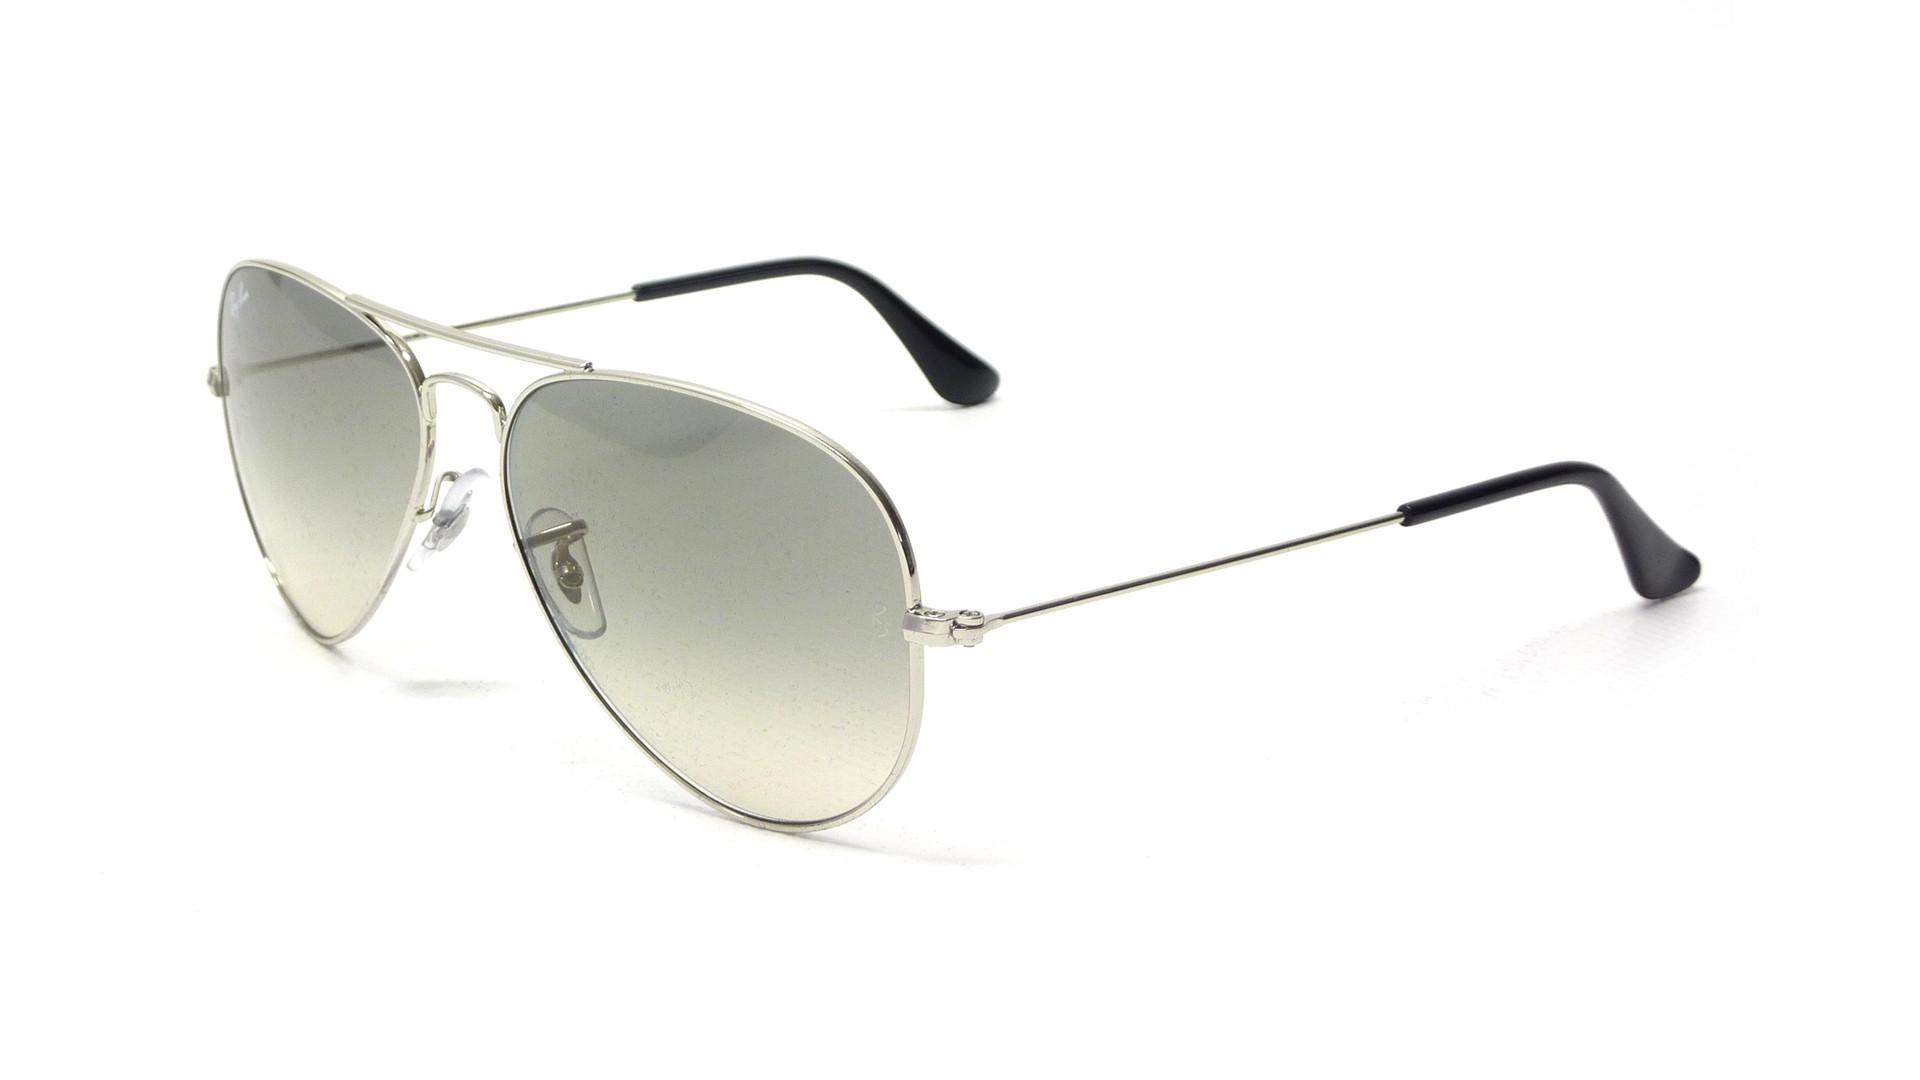 2ed23bde0b899f Ray-Ban Aviator Metal Silber RB3025 003/32 58-14 | Price 87,42 € |  Visiofactory